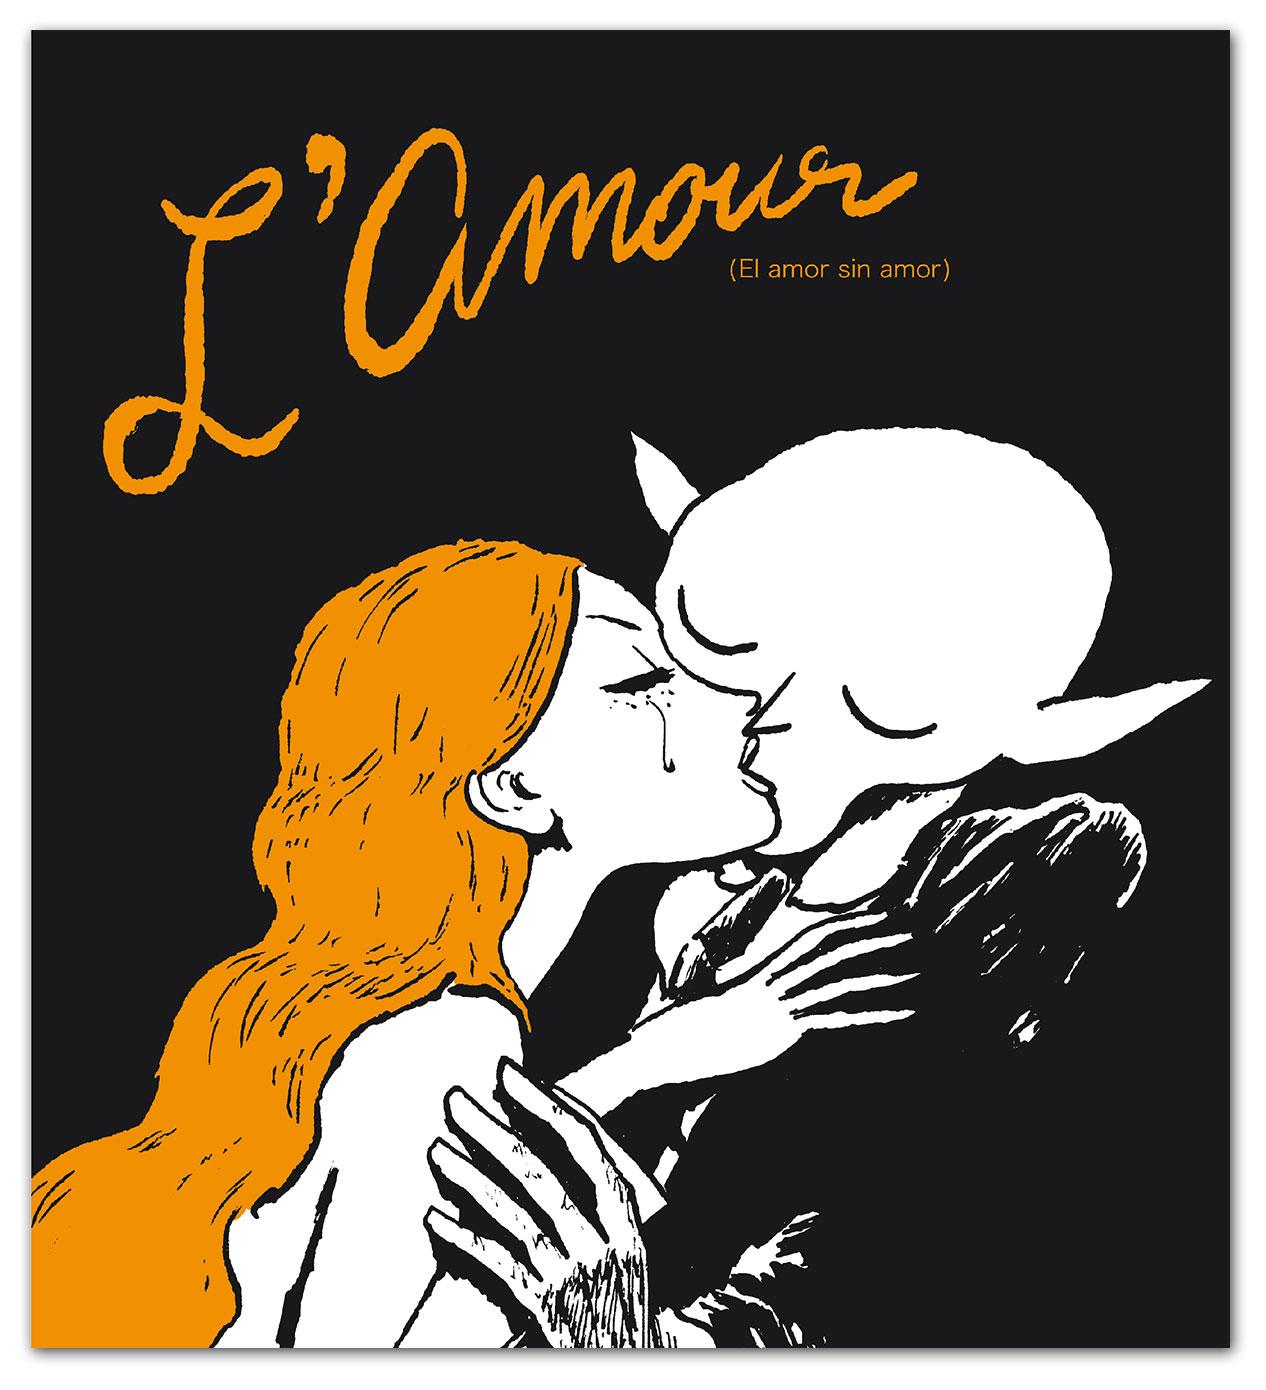 L'amour (el amor sin amor) - Joann Sfar